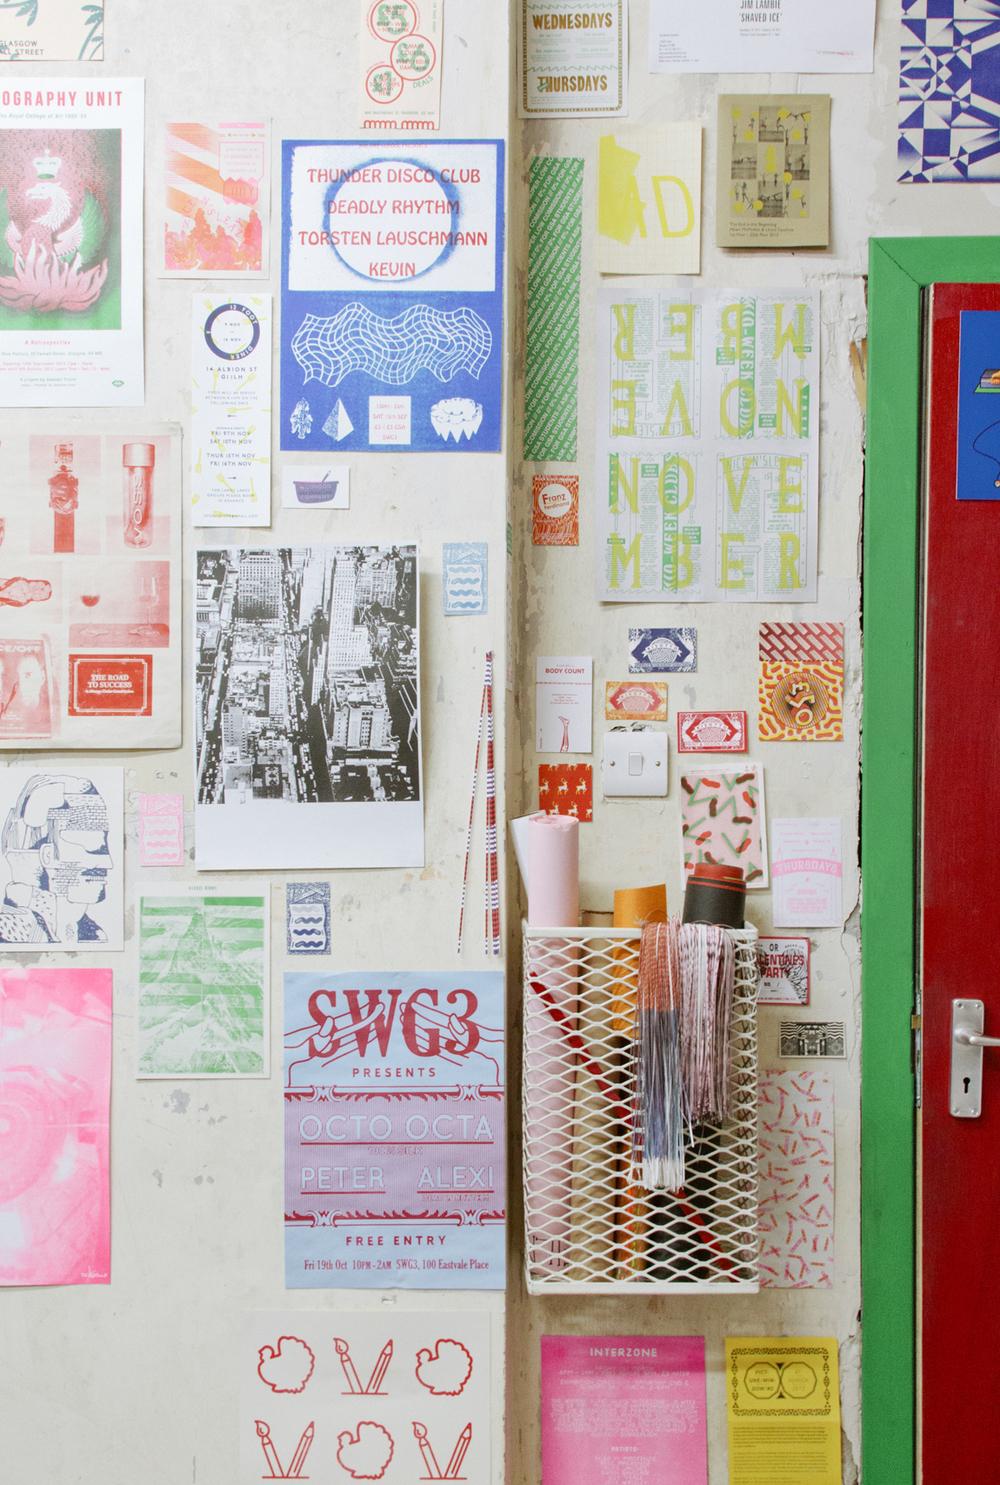 Print Club Ltd. visits Risotto Studio, Glasgow www.jointheprintshop.com